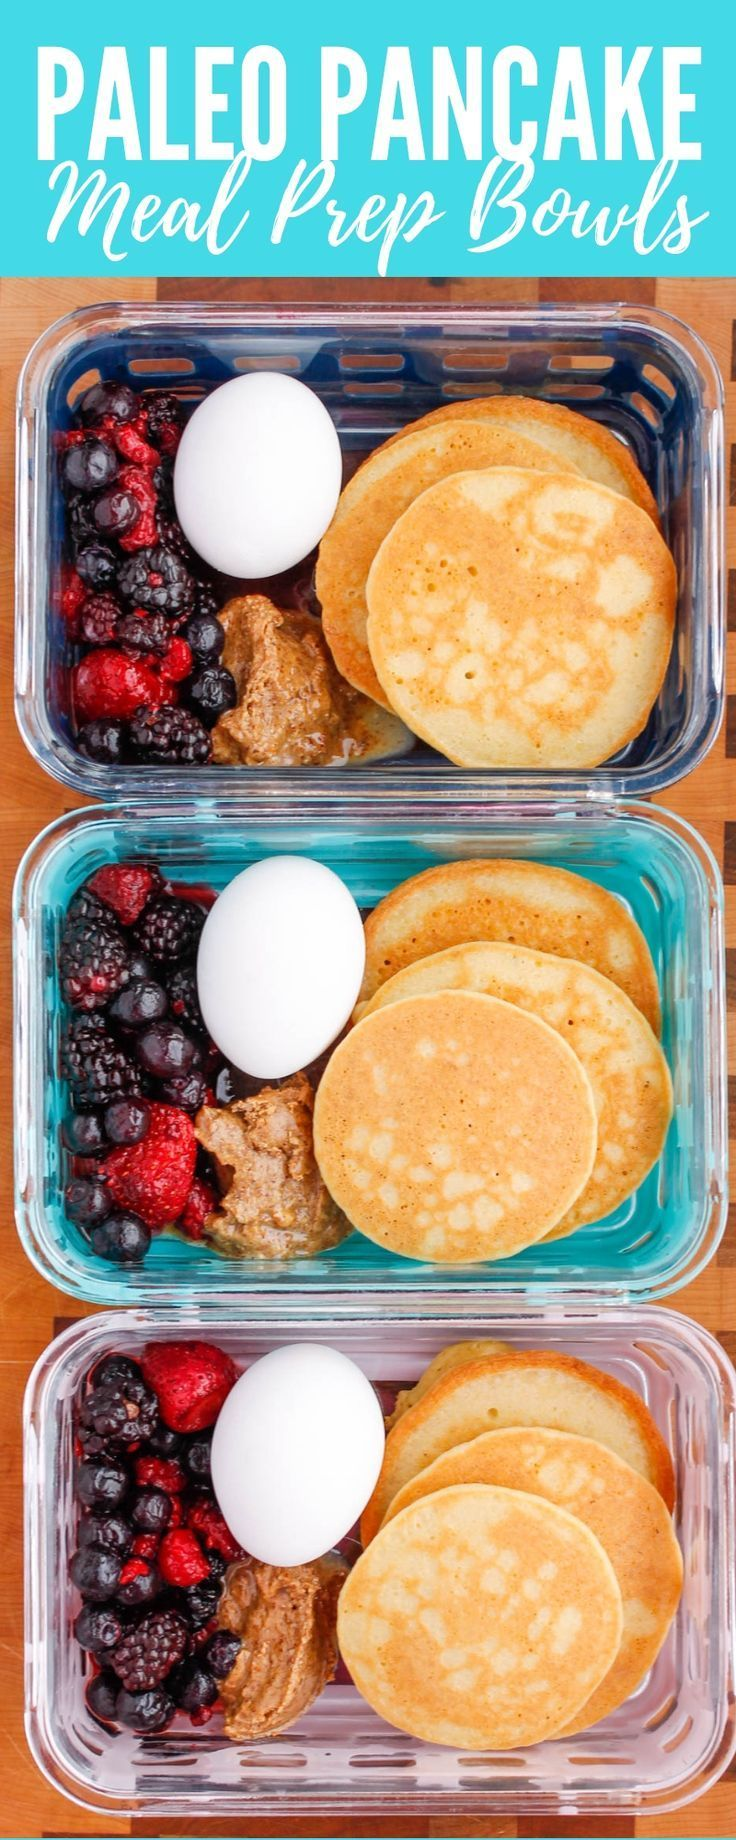 Paleo Pancake Breakfast Meal Prep Bowls images